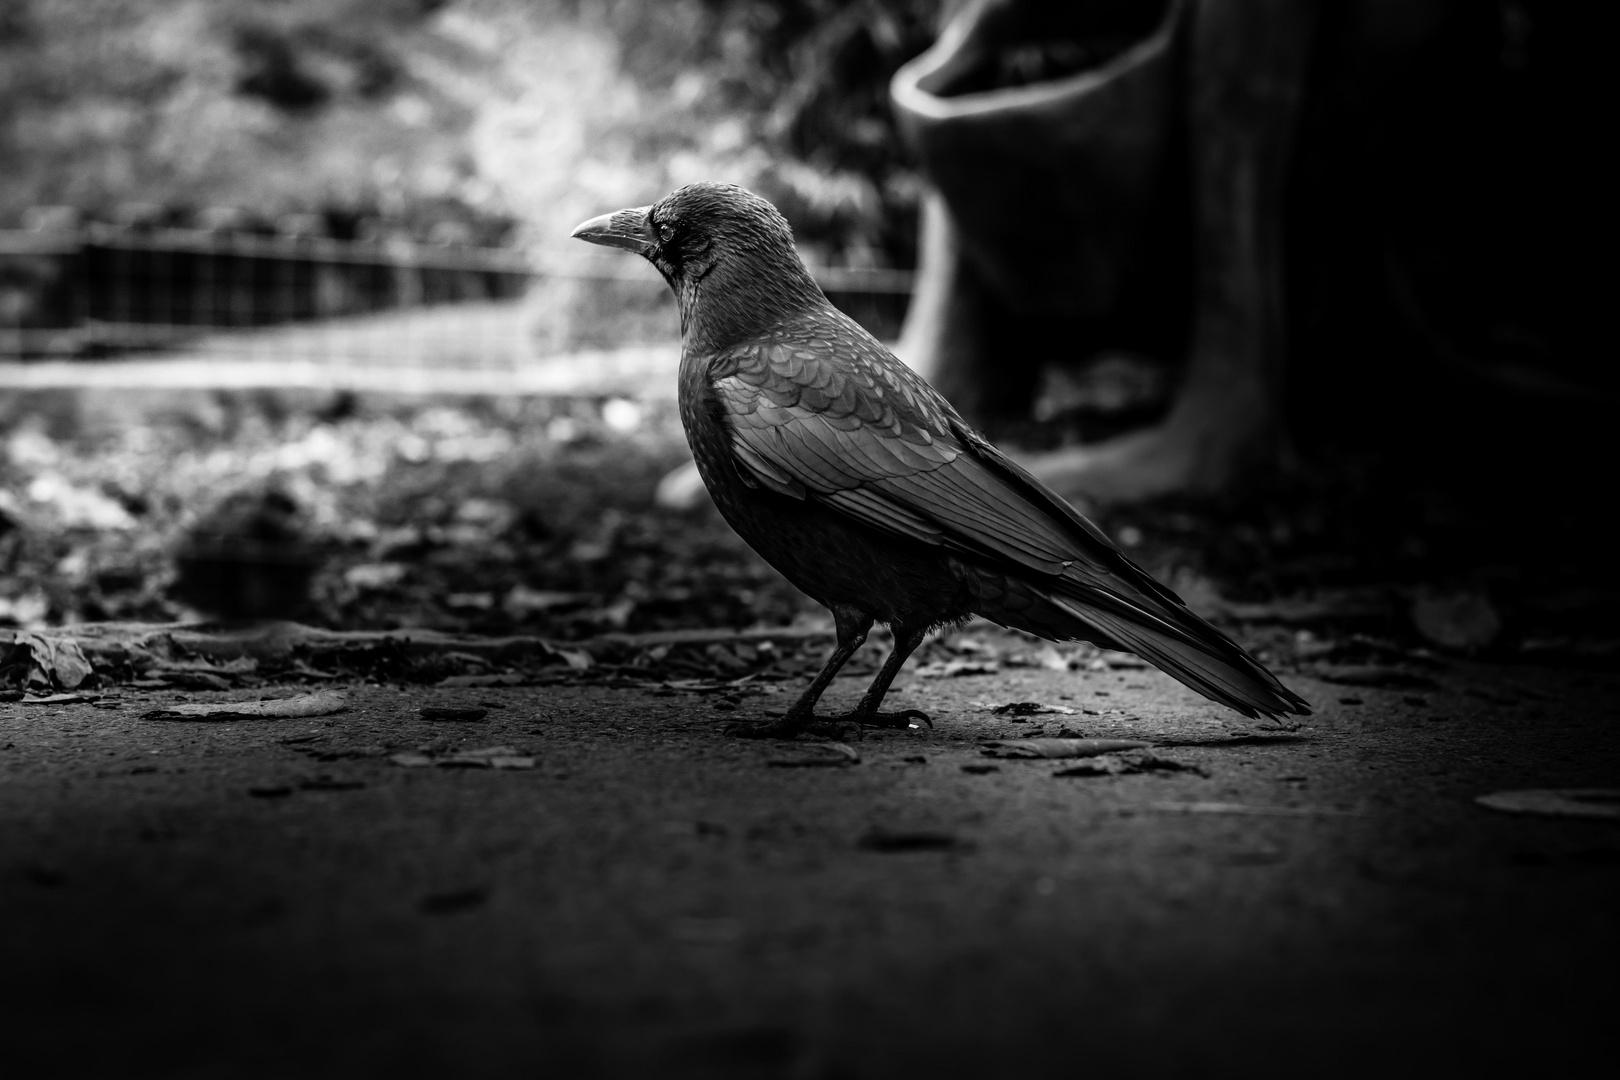 ...Blackbird